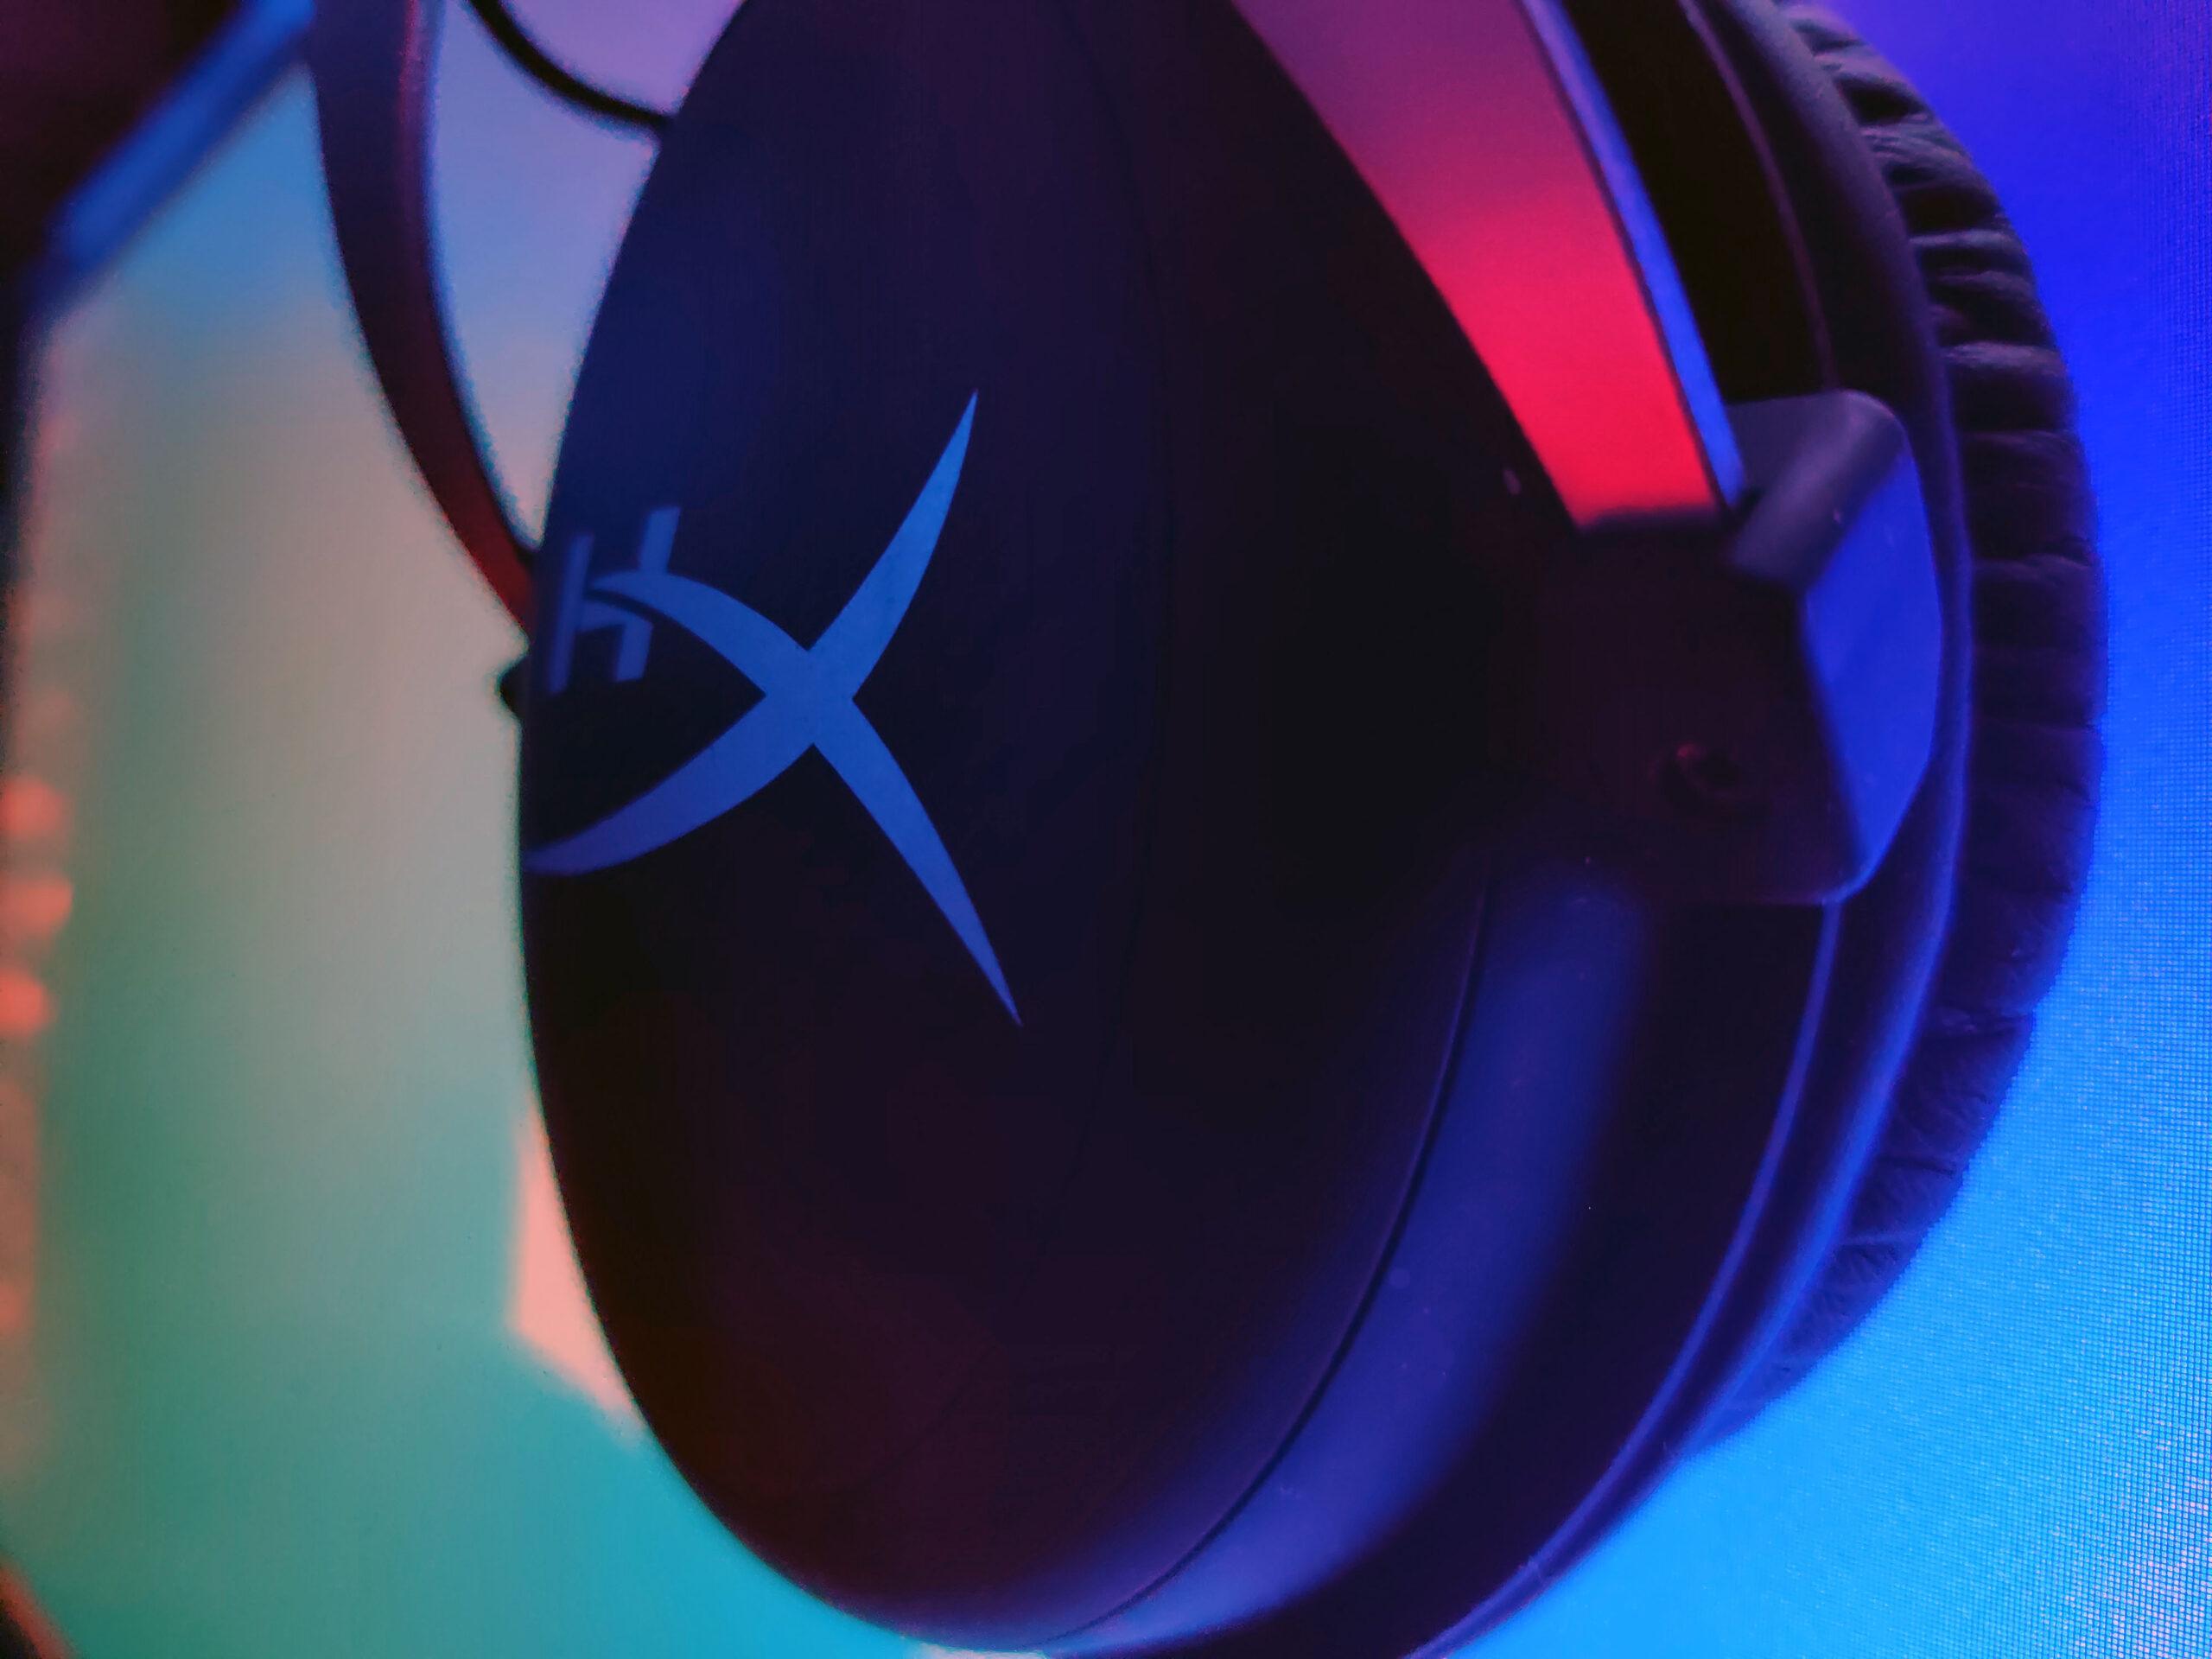 GC HyperX Headphone